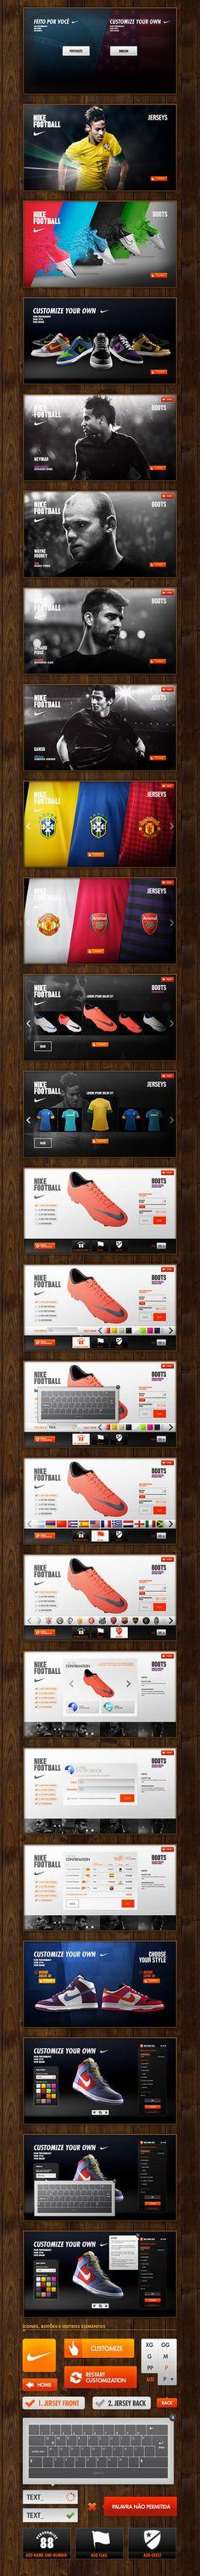 #Nike Touch by Fabricio Alves, via #Behance #Webdesign #Digital #UI